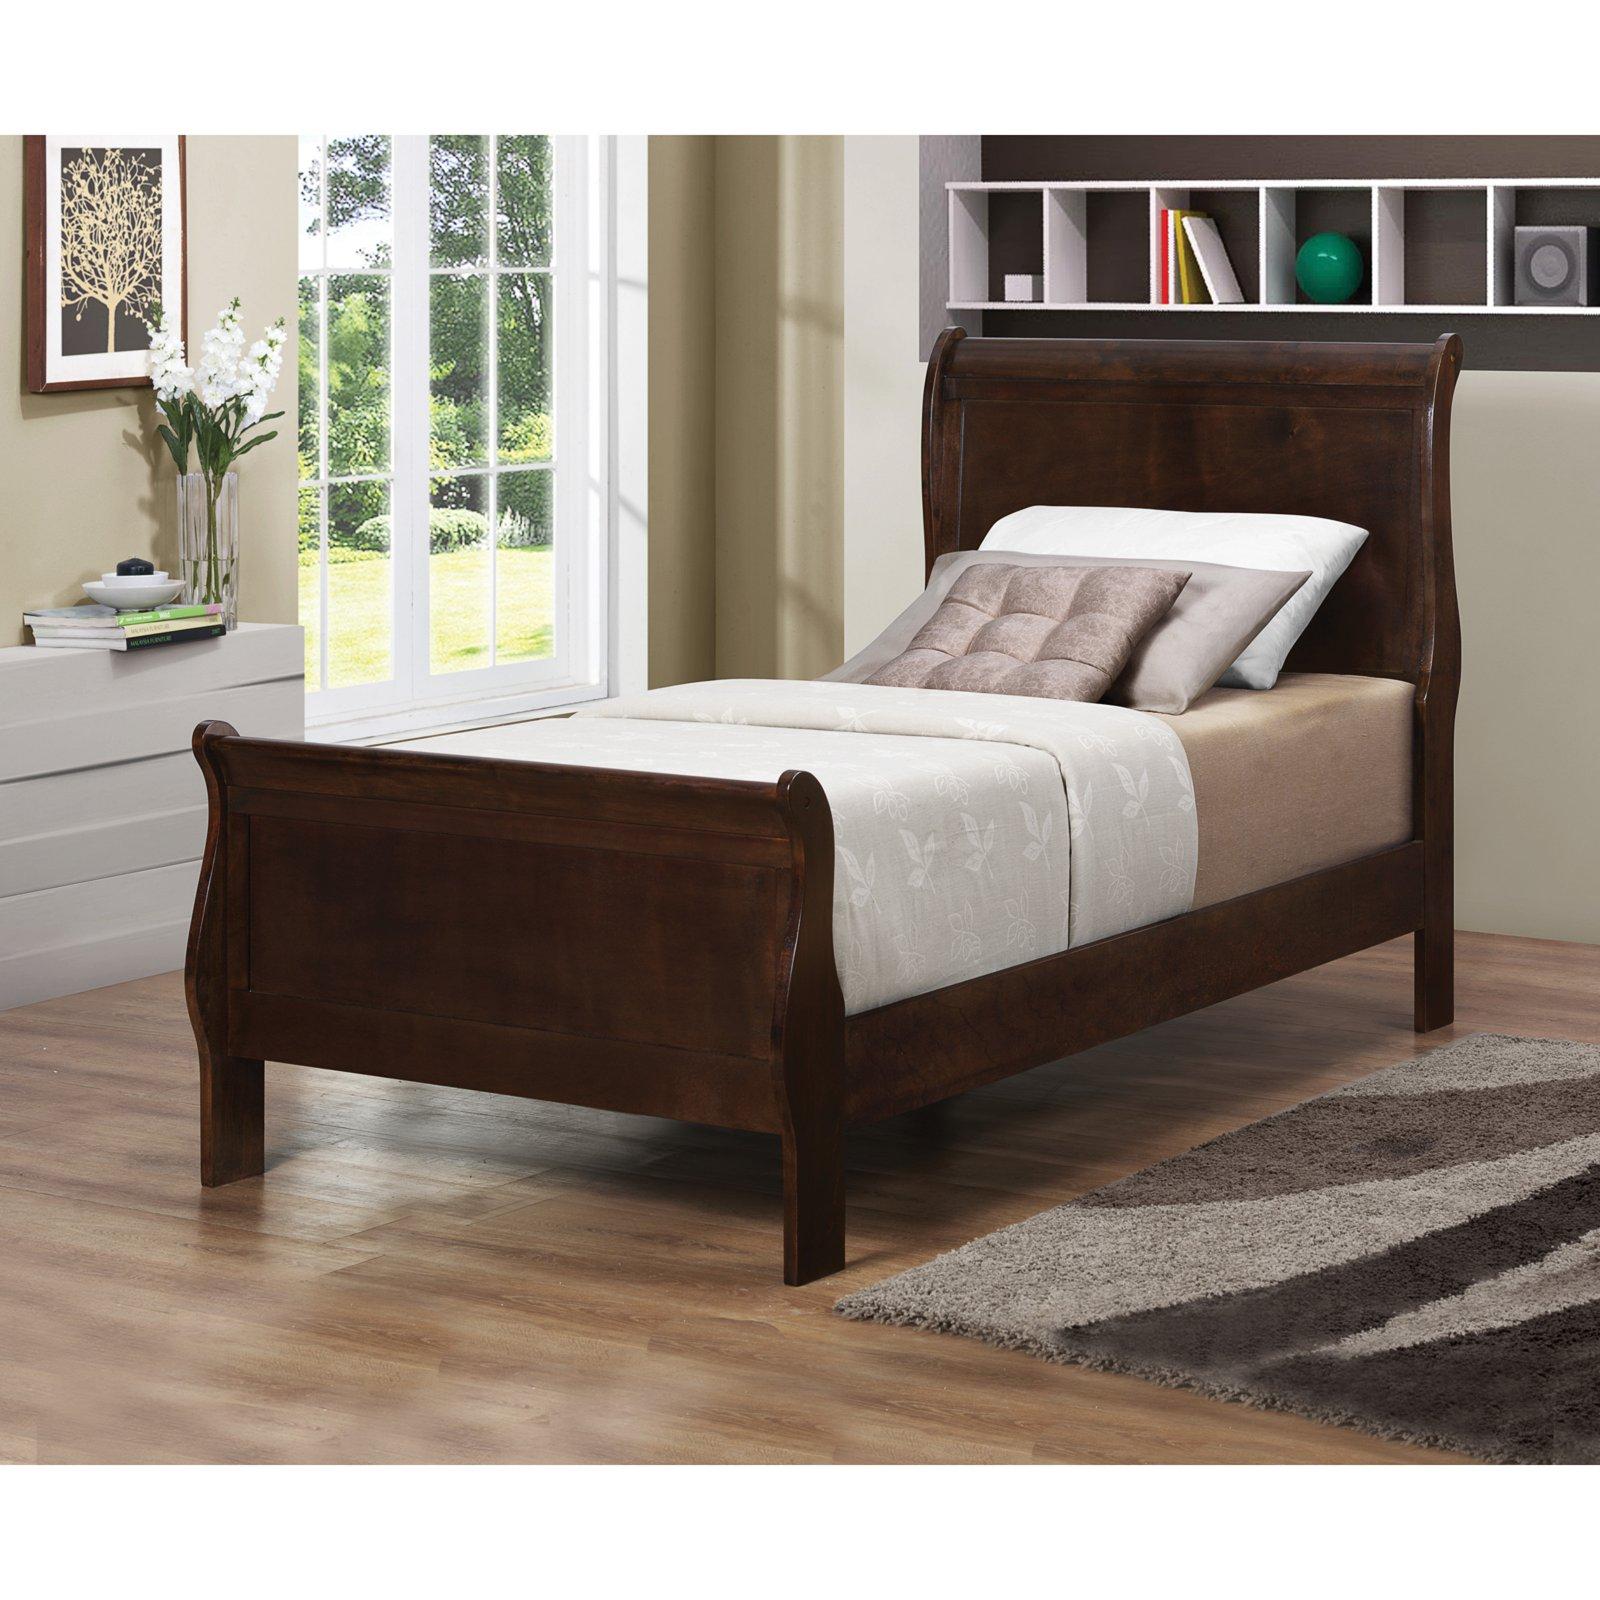 Coaster Furniture Louis Philippe III Wood Sleigh Bed